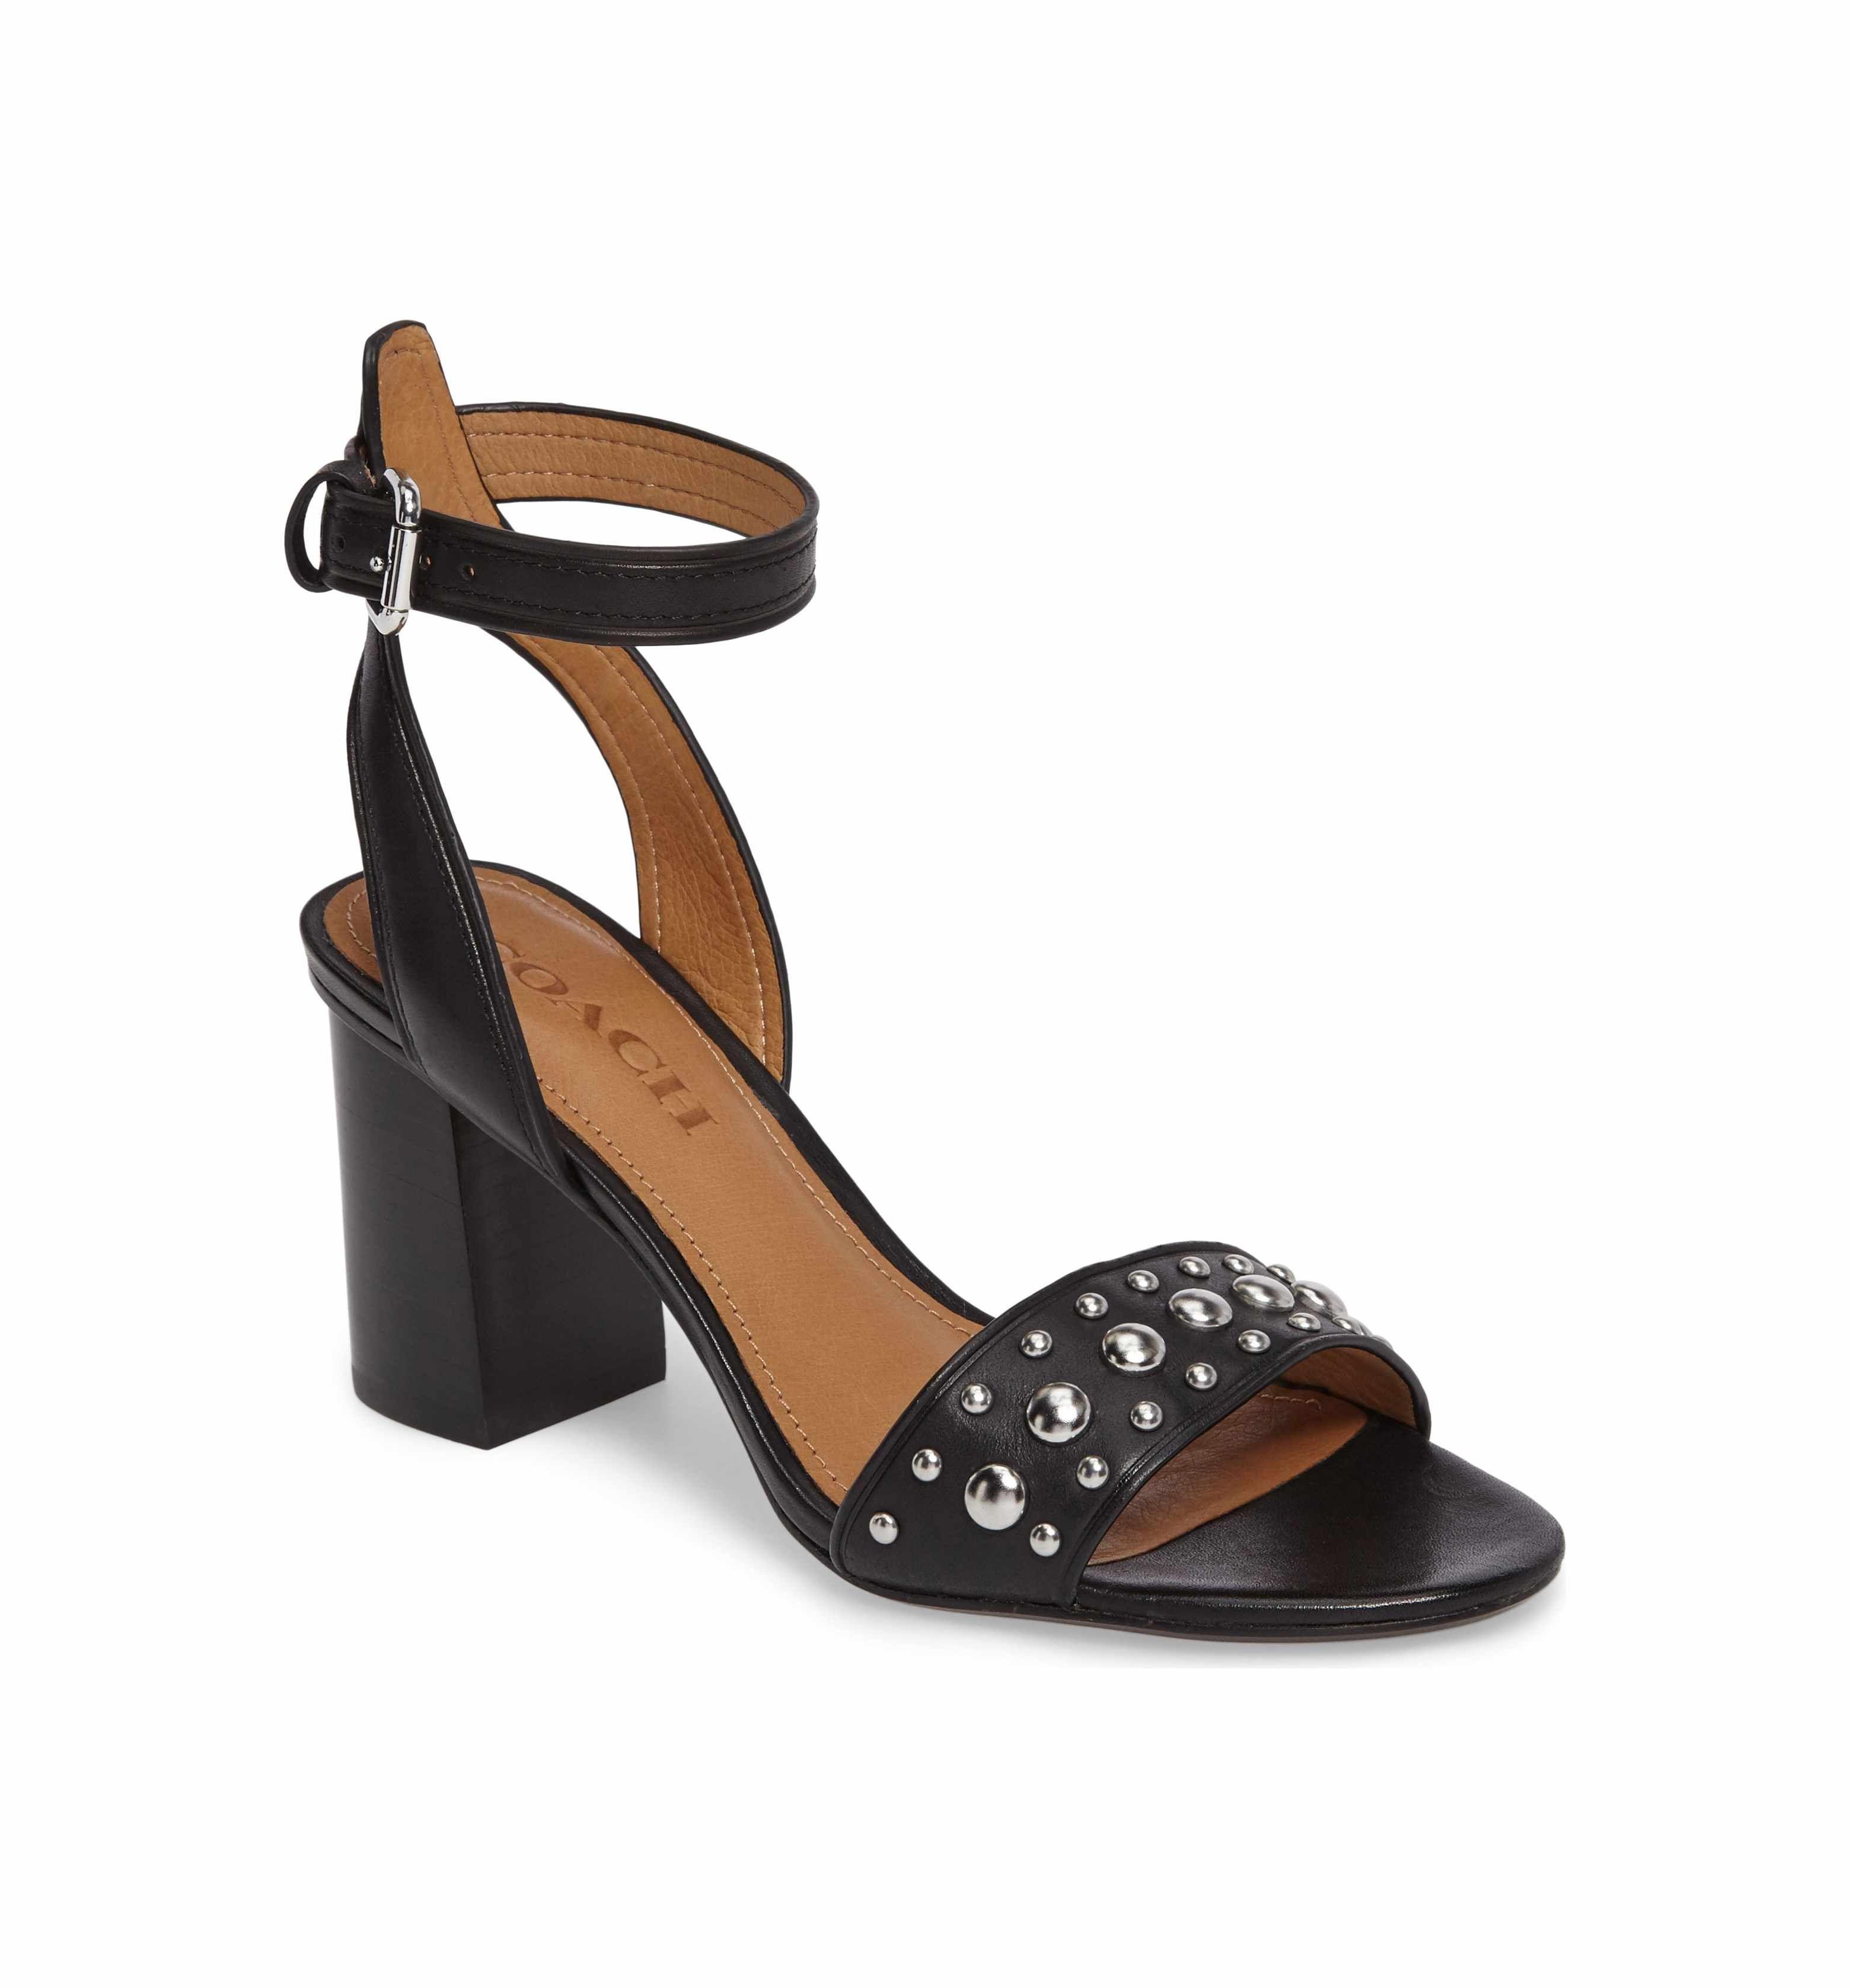 5ab864ea60b0 Main Image - COACH Paige Block Heel Sandal (Women)